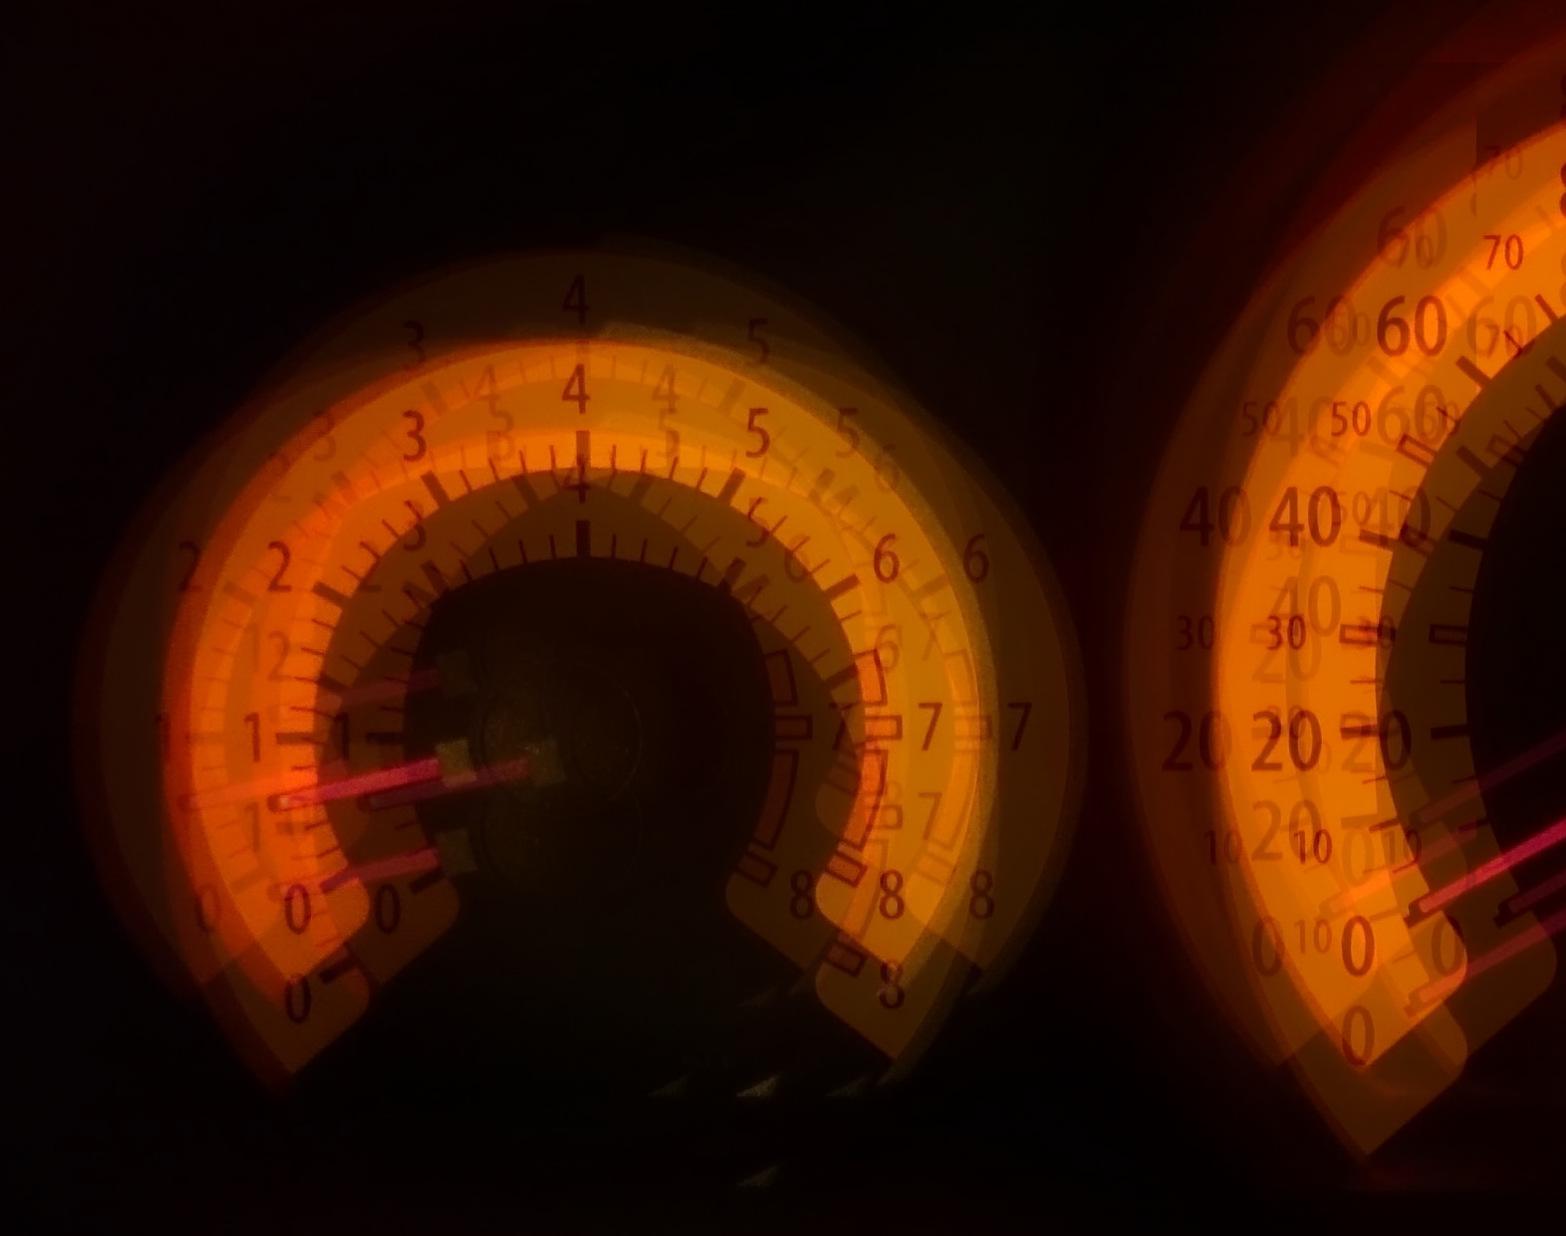 шумоизоляция и виброизоляция автомобиля-07